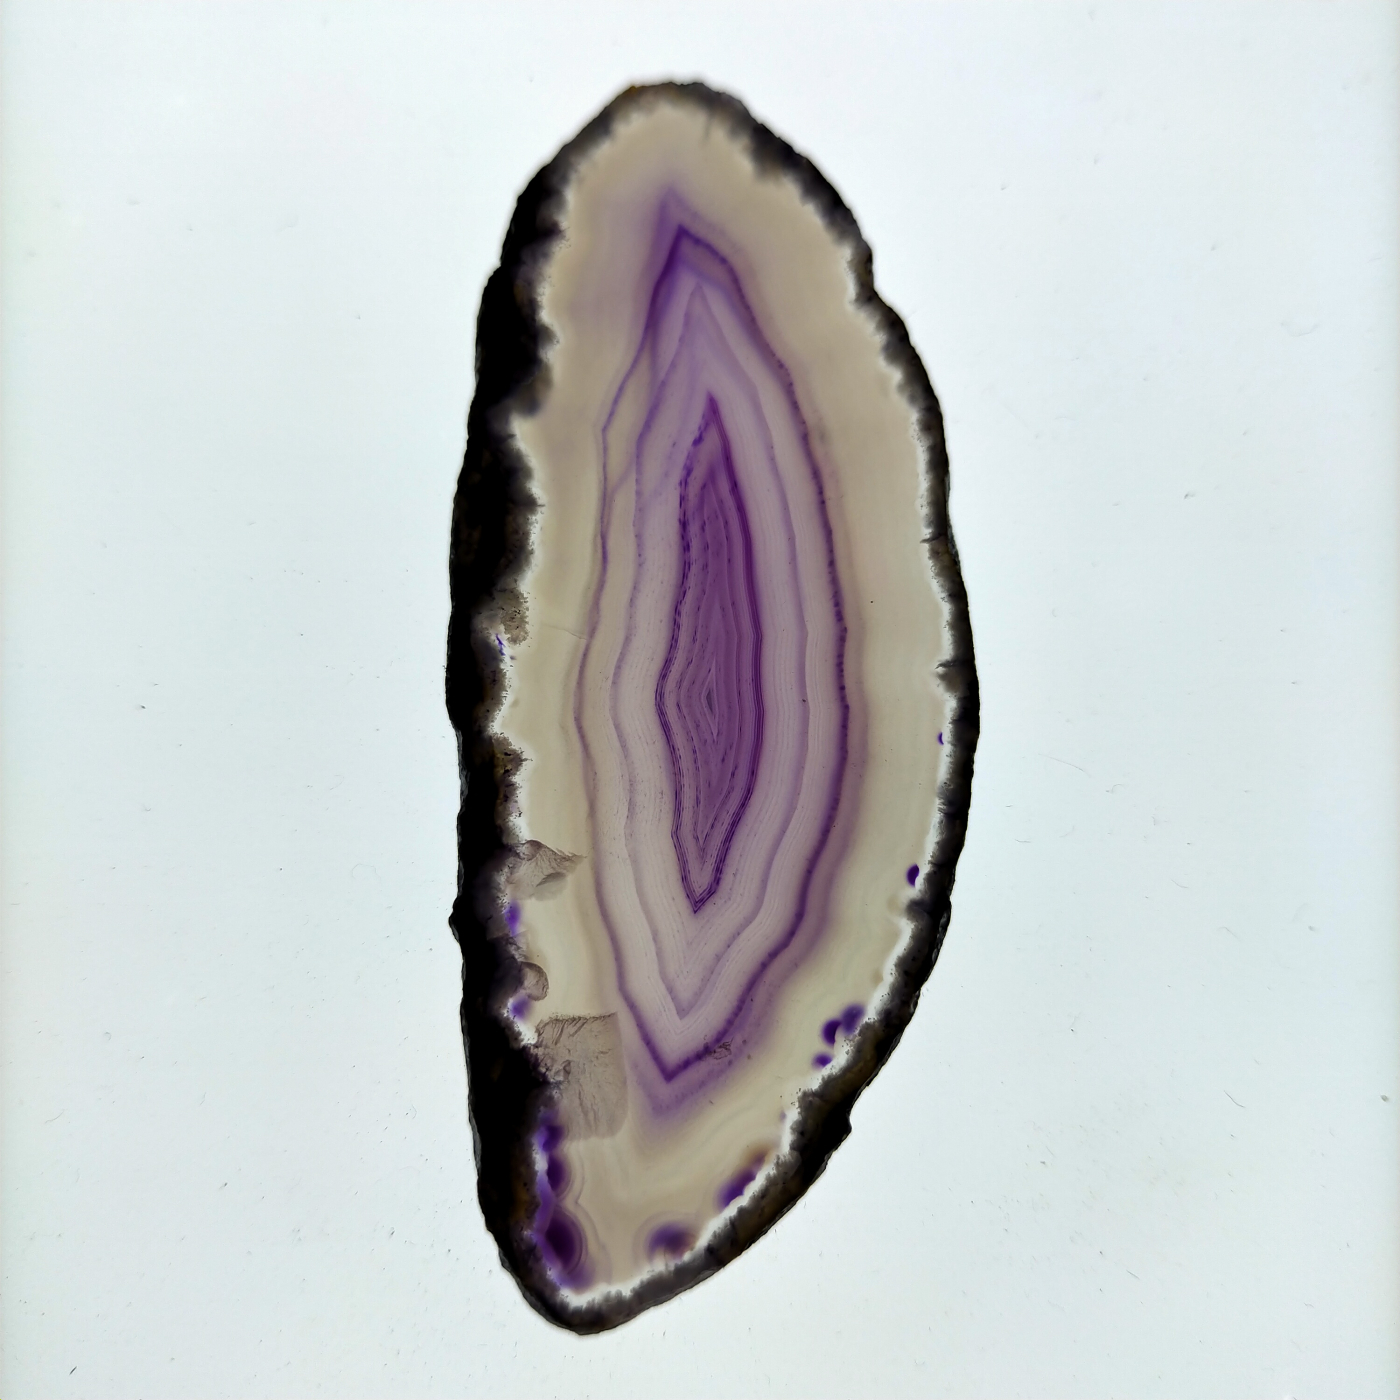 Àgata laminada lila transllúcida -